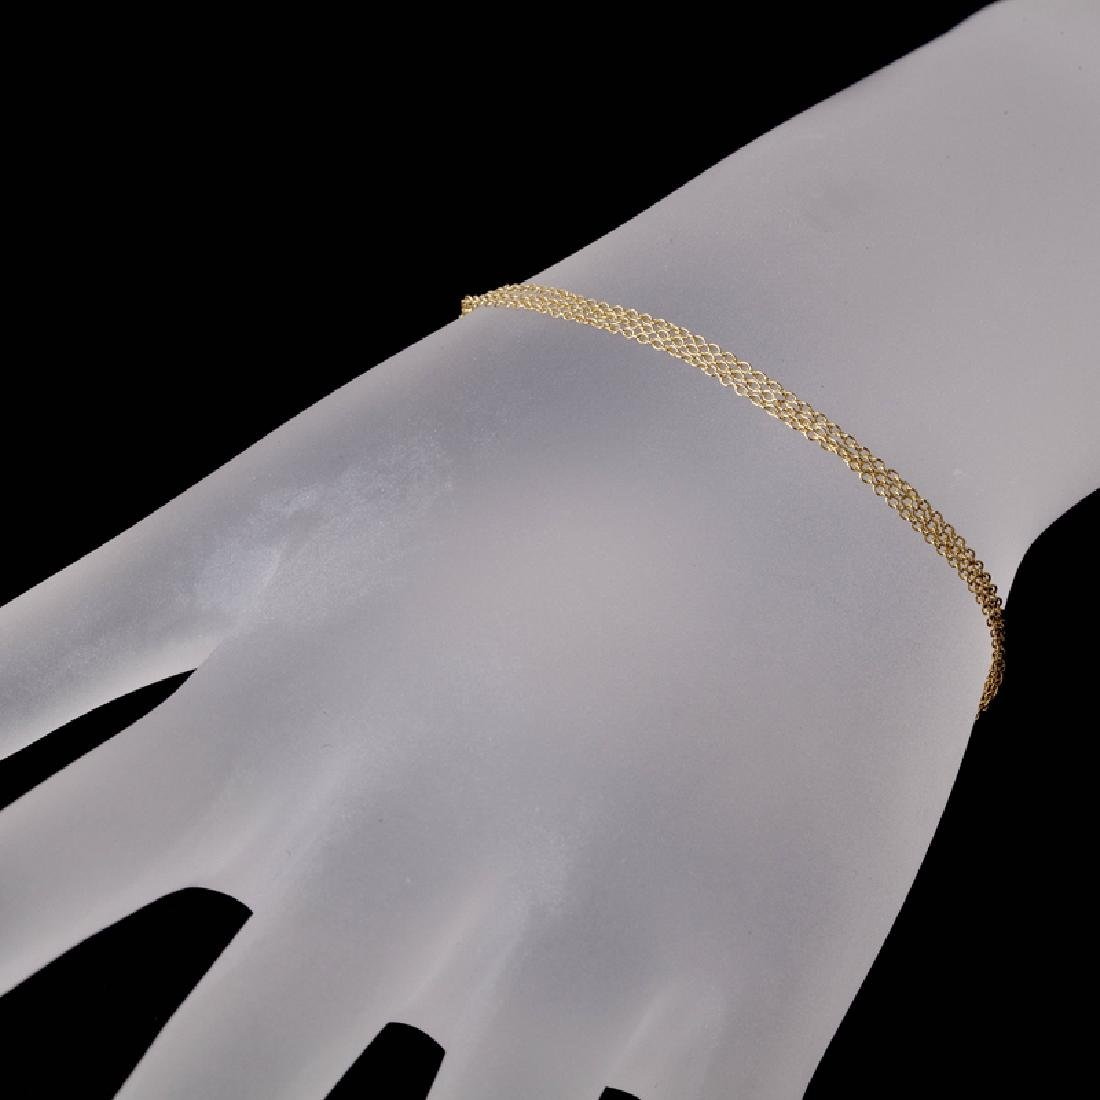 *Fine Jewelry 14KT Gold, 3 Strand 1.5GR, 7'' Oval Link